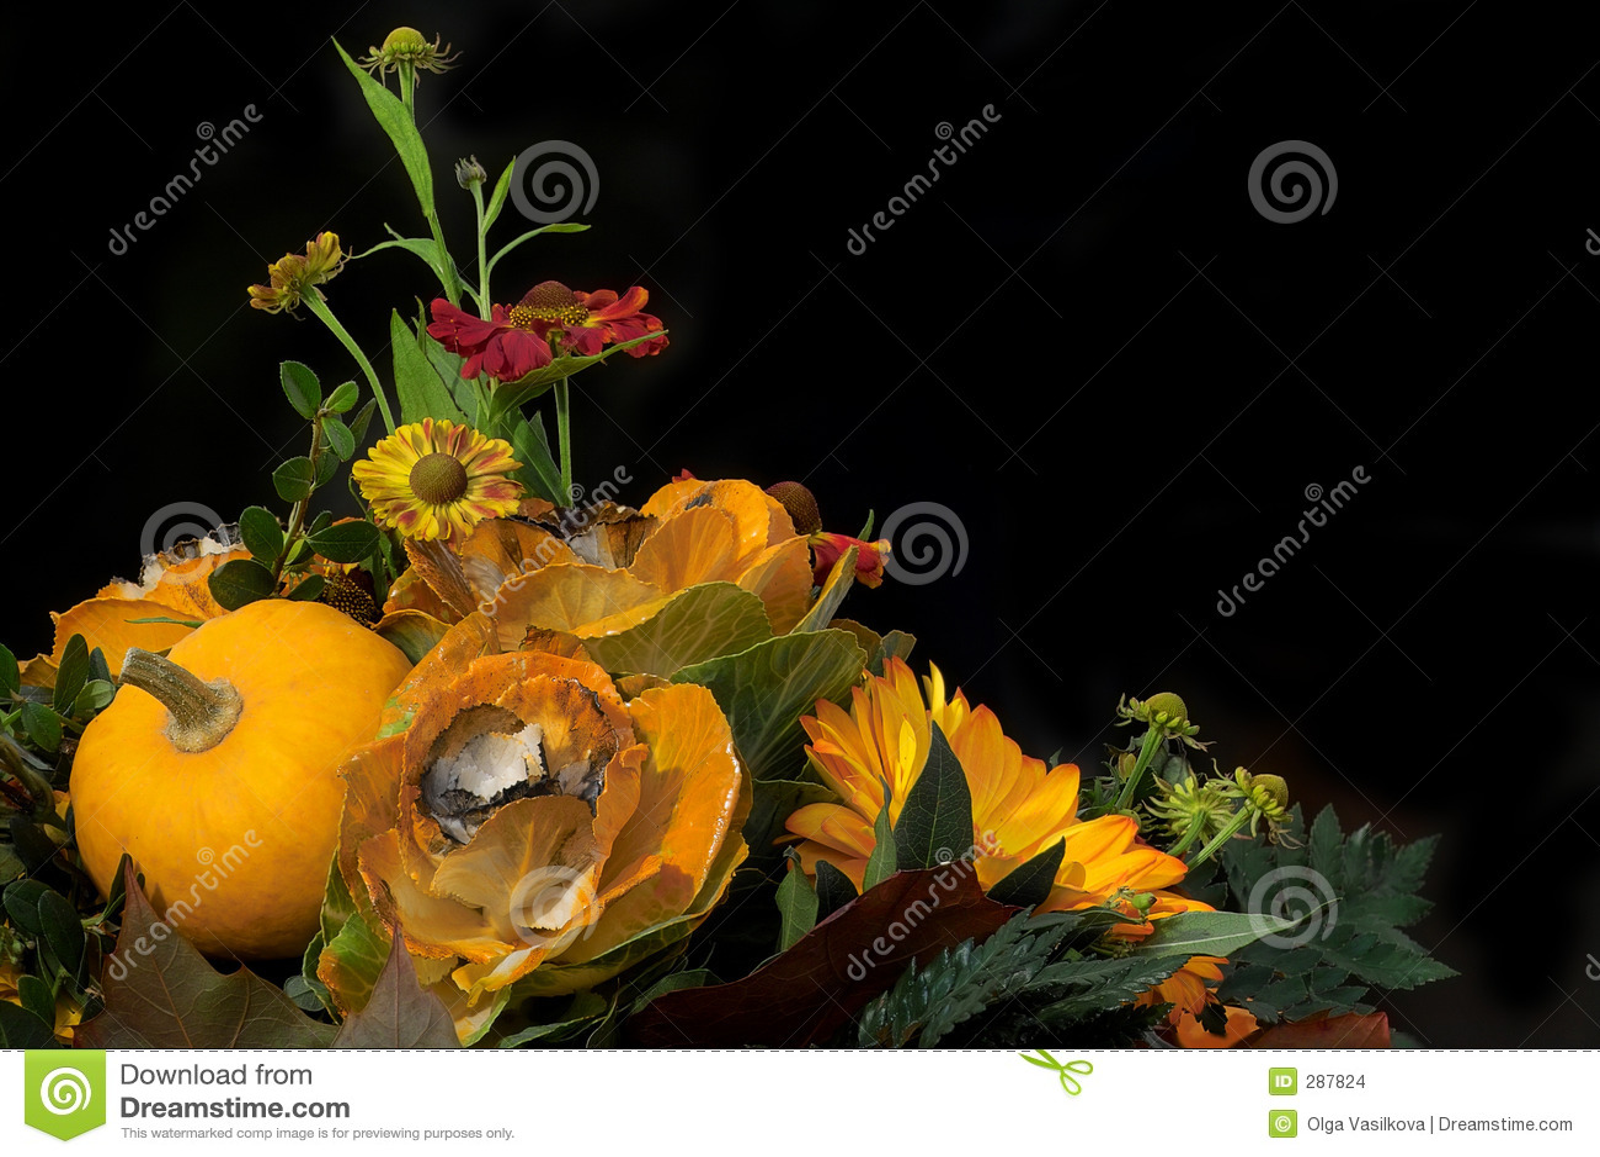 composition florale d 39 automne images stock image 287824. Black Bedroom Furniture Sets. Home Design Ideas